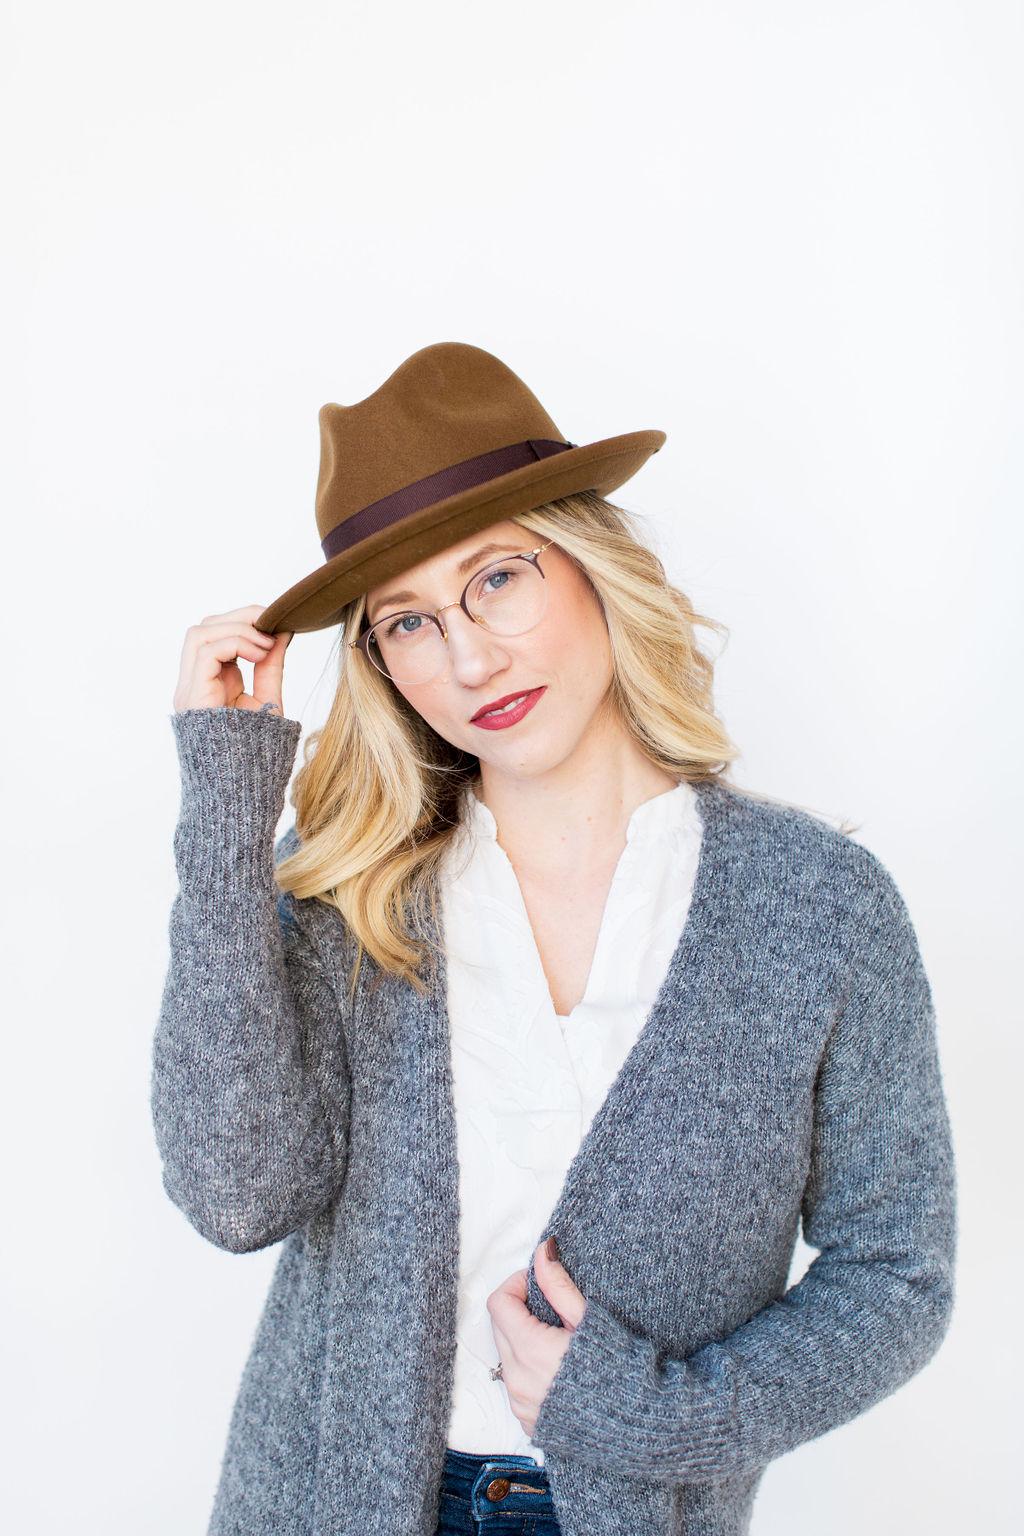 winter headshot of roxanna sue photos with goorin hat